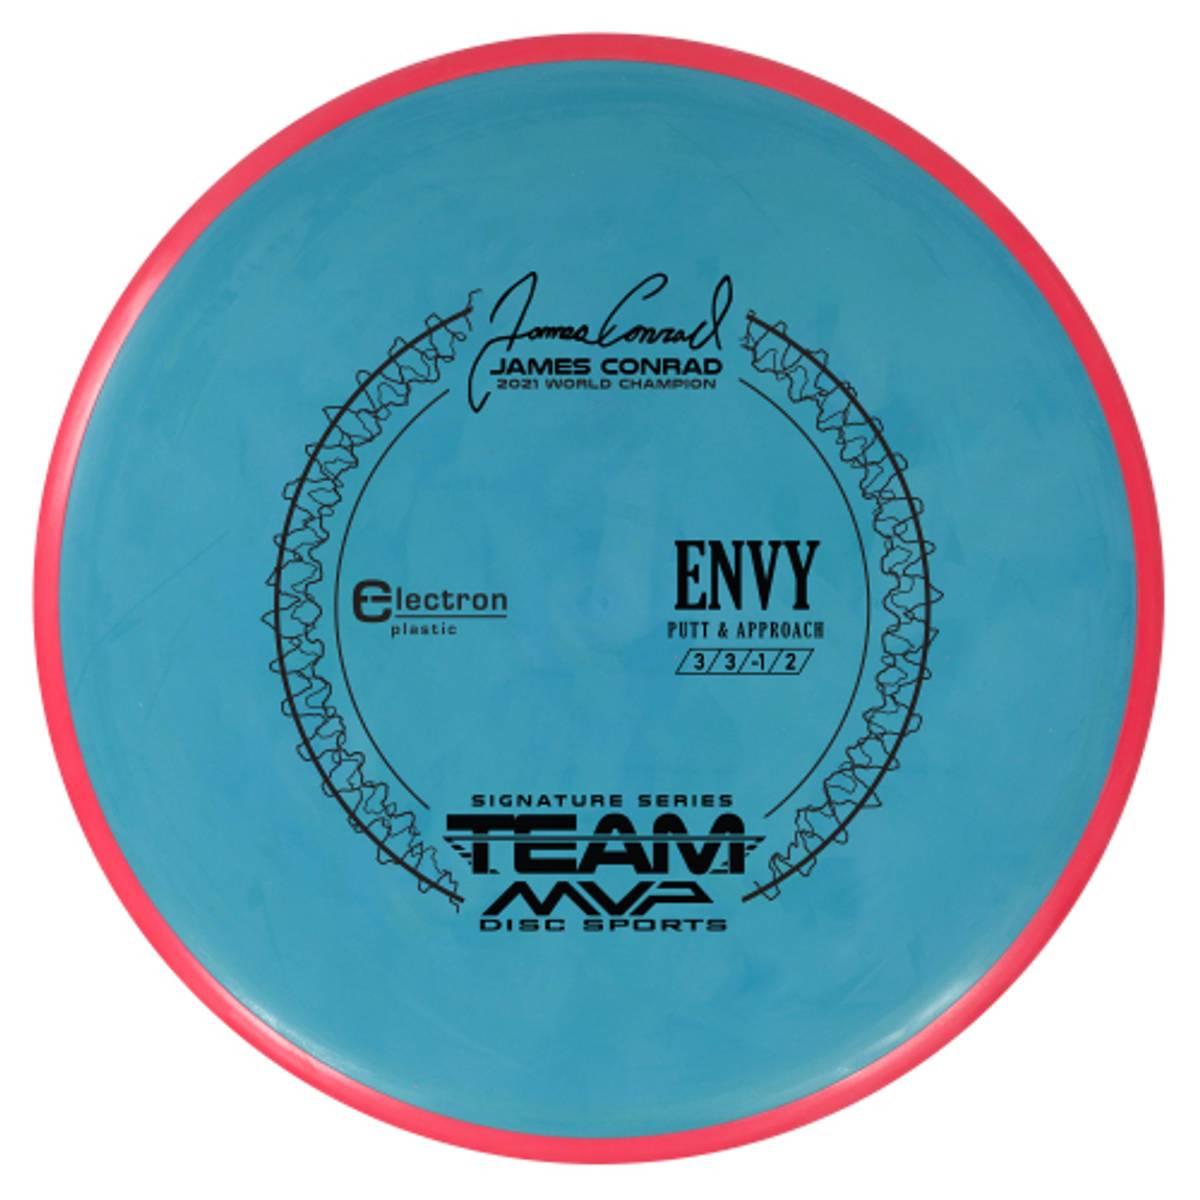 Axiom Electron Envy Medium - James Conrad Signature Series